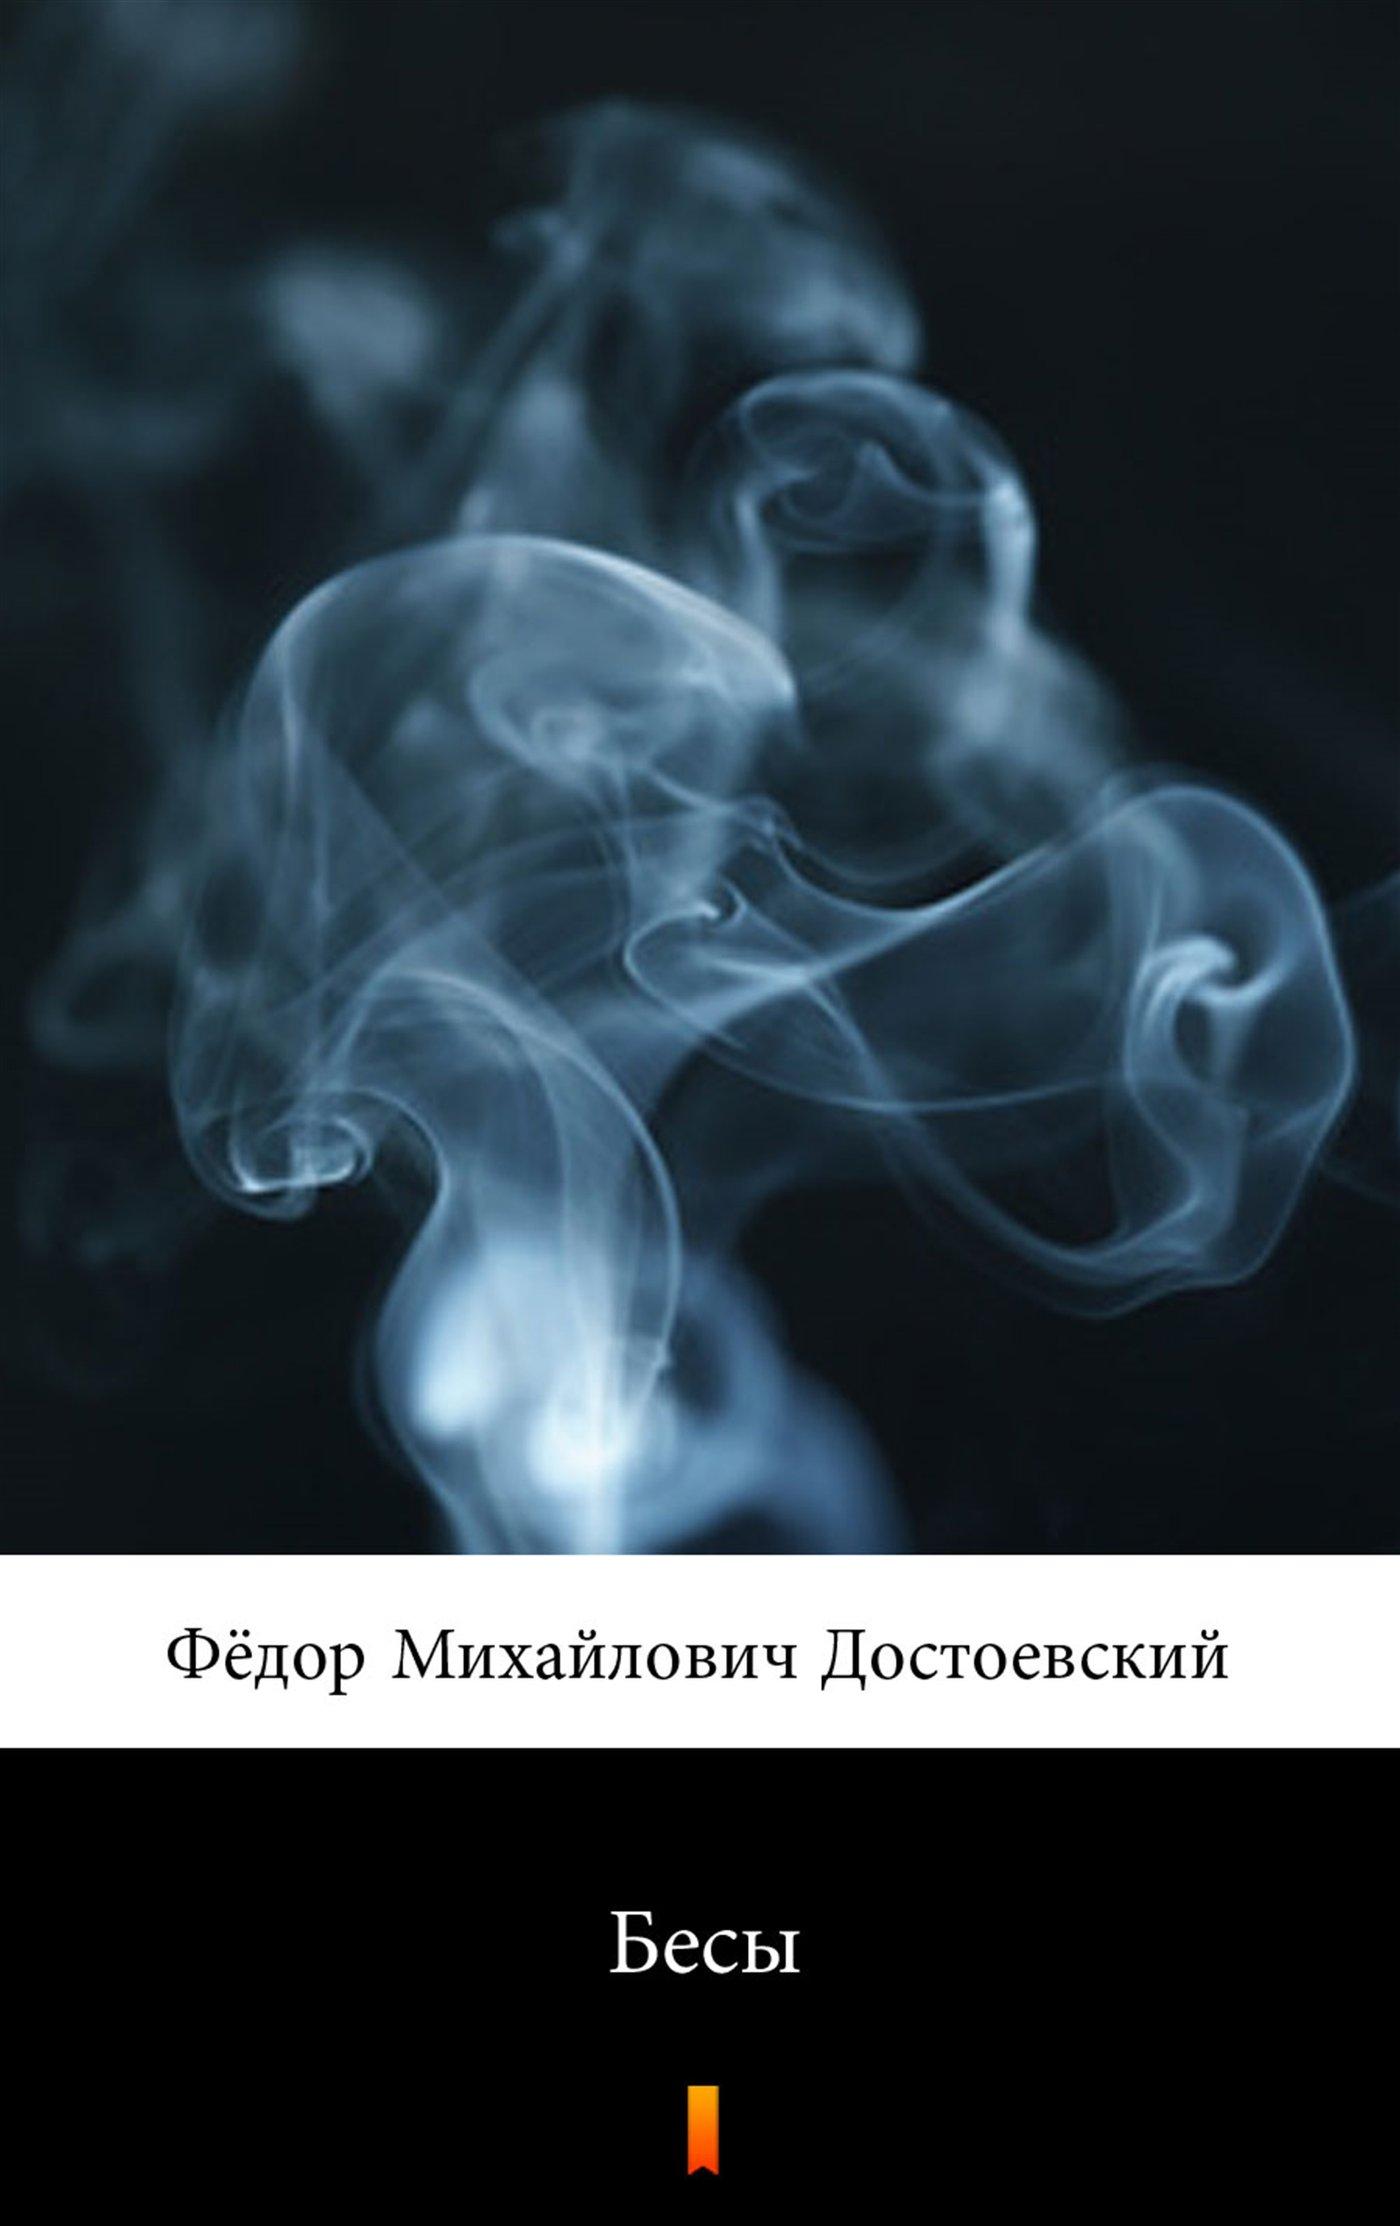 Бесы - Ebook (Książka na Kindle) do pobrania w formacie MOBI